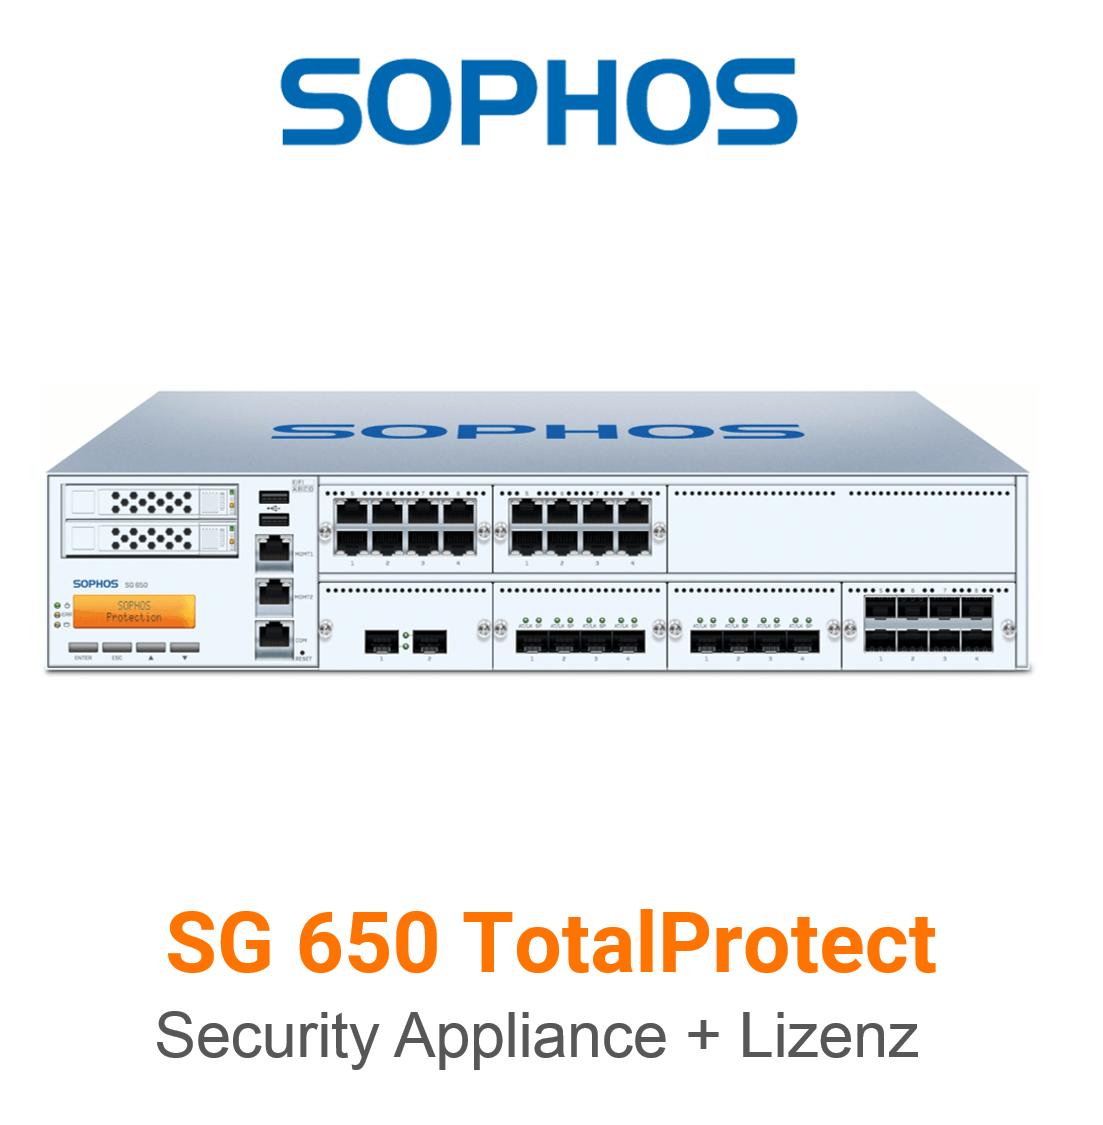 Sophos SG 650 TotalProtect Bundle (Hardware + Lizenz)